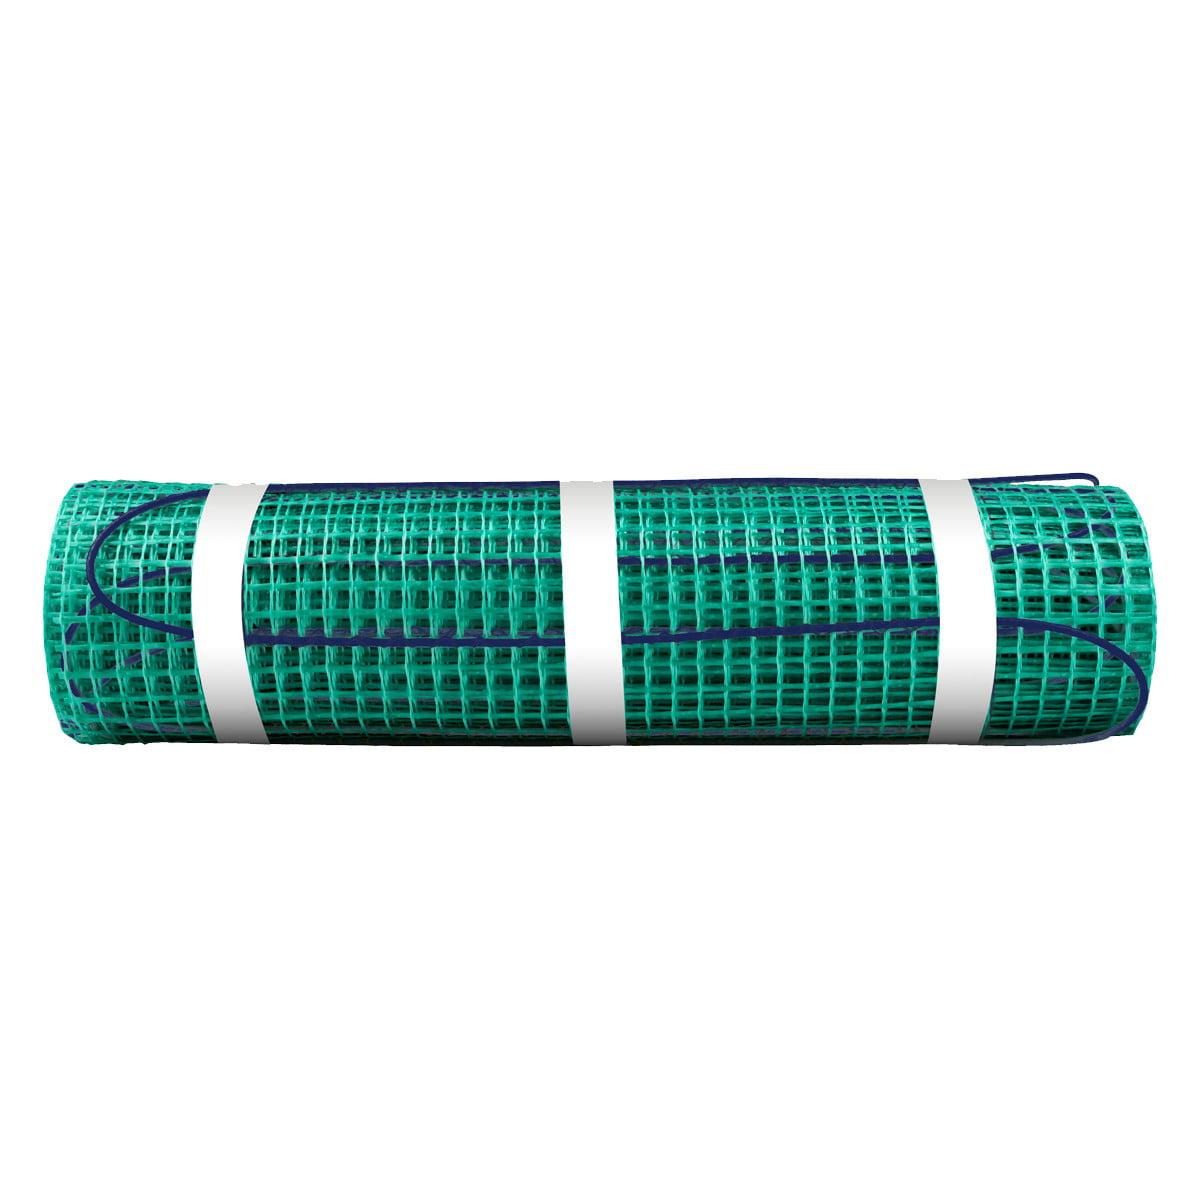 WarmlyYours TRT120-1.5x06 TempZone 120V 1.2A 1.5 Foot x 6 Foot Flex Roll